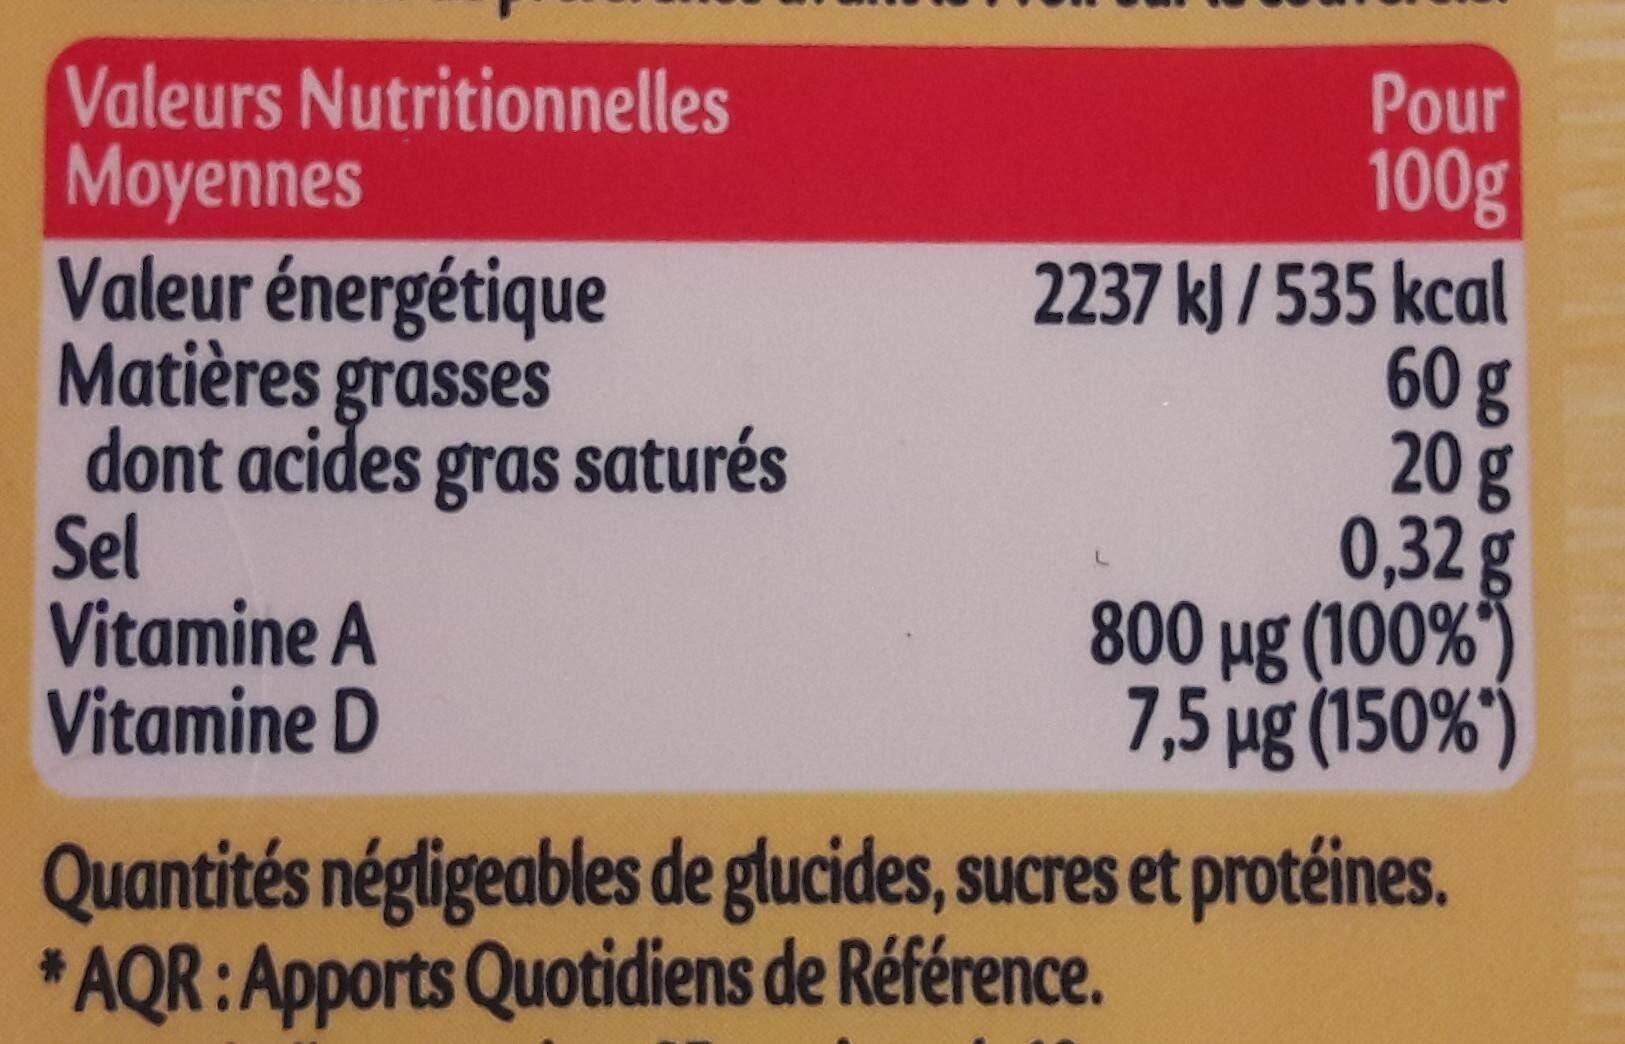 Planta Fin (Doux - margarine) - Informations nutritionnelles - fr